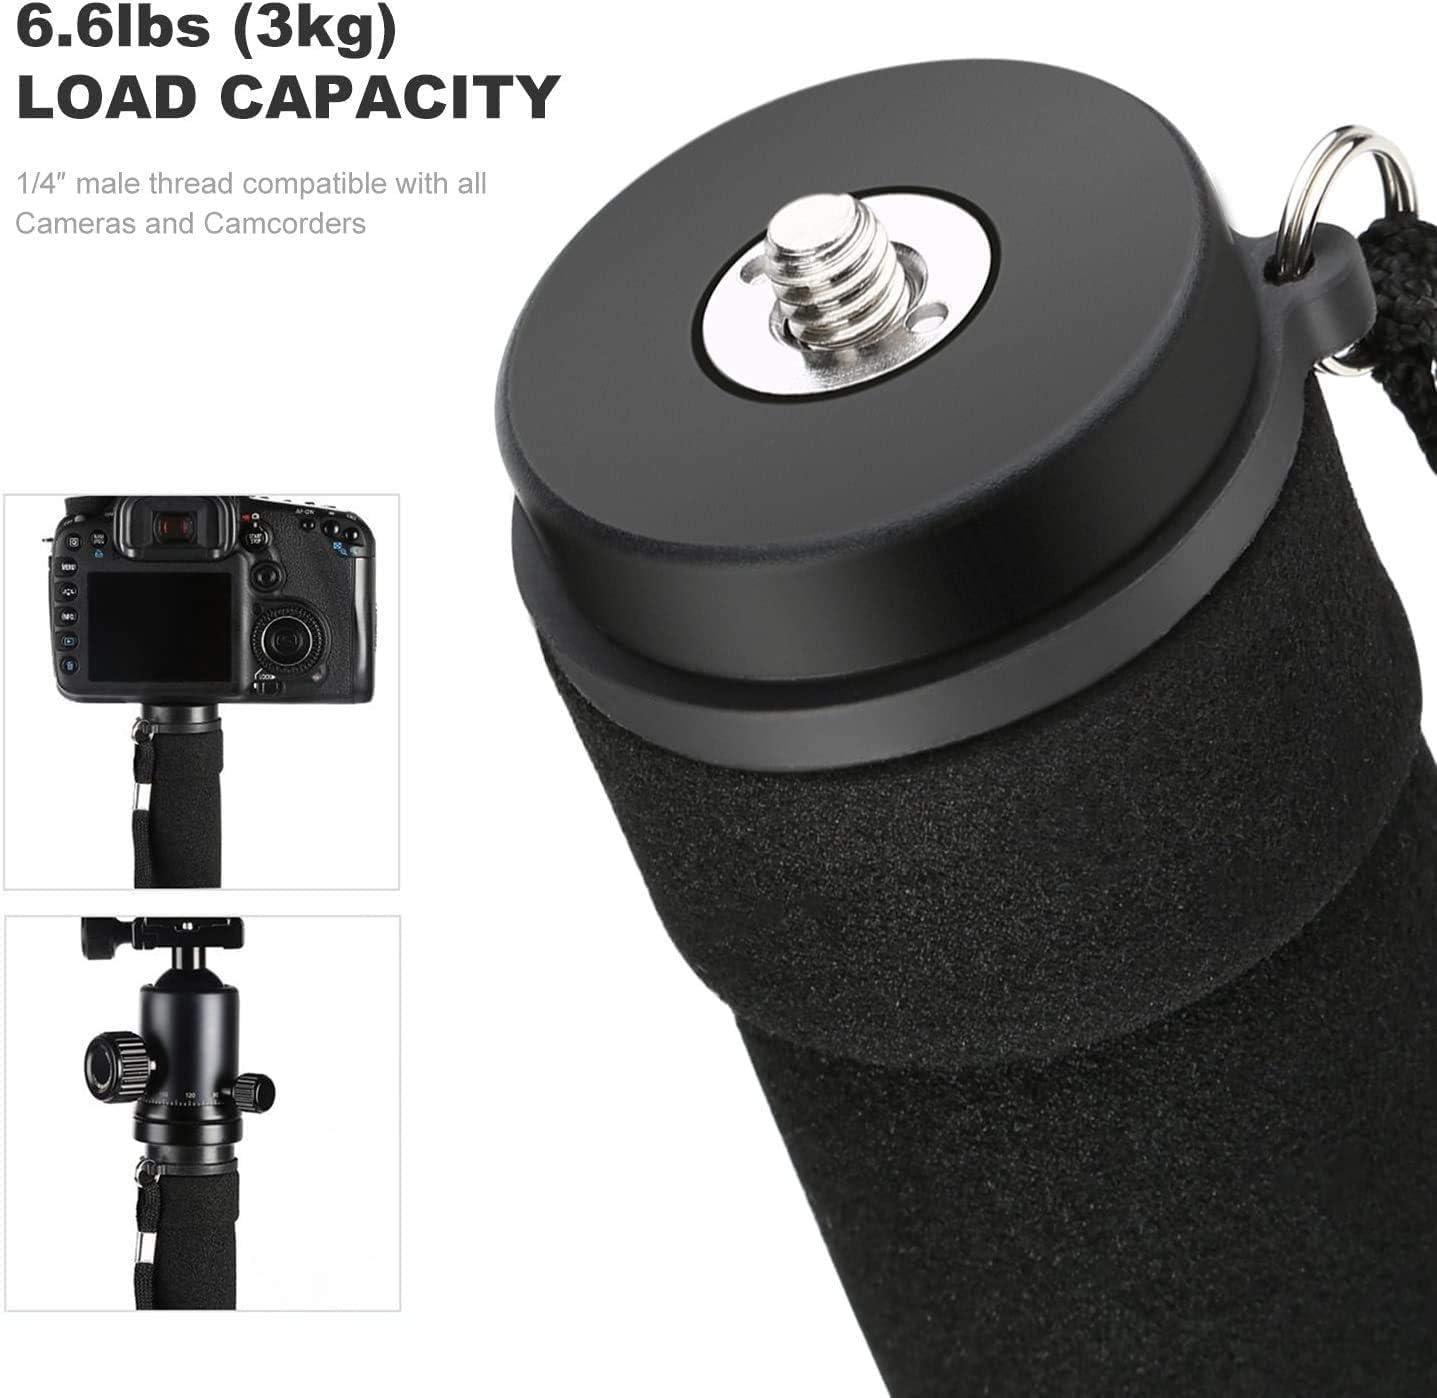 "Camera Monopod, K&F Concept 4-Section 67""/171CM Compact Portable Travel DSLR Monopod Unipod Stand Walking Trekking Stick Aluminum Alloy Lightweight SLR Cameras Canon Nikon Sony Camcorder Video : Camera & Photo"